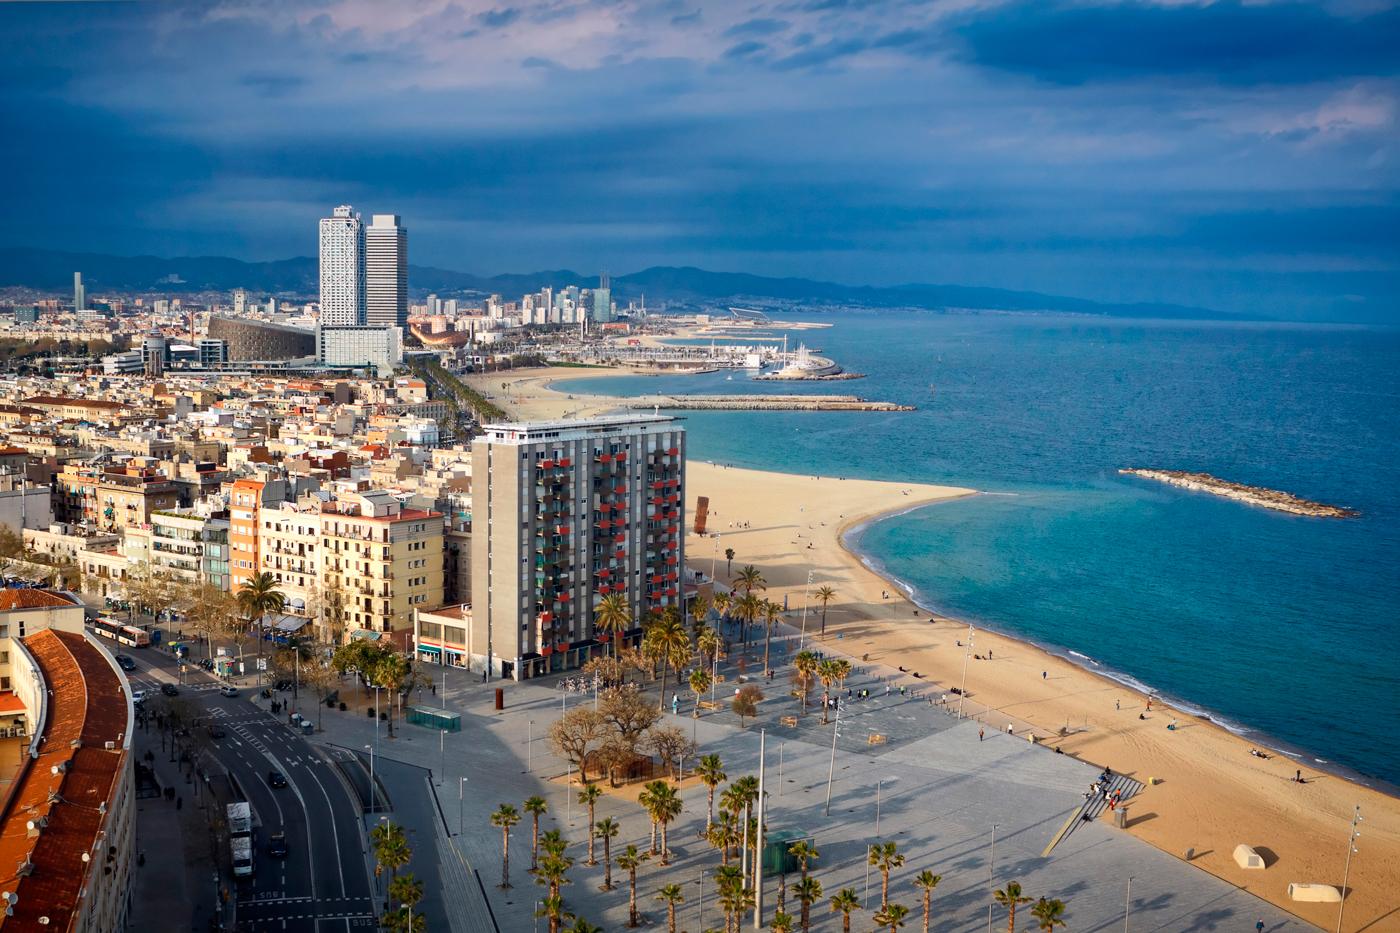 Barcelona Spain Skin Courses Michael Boychuck Online